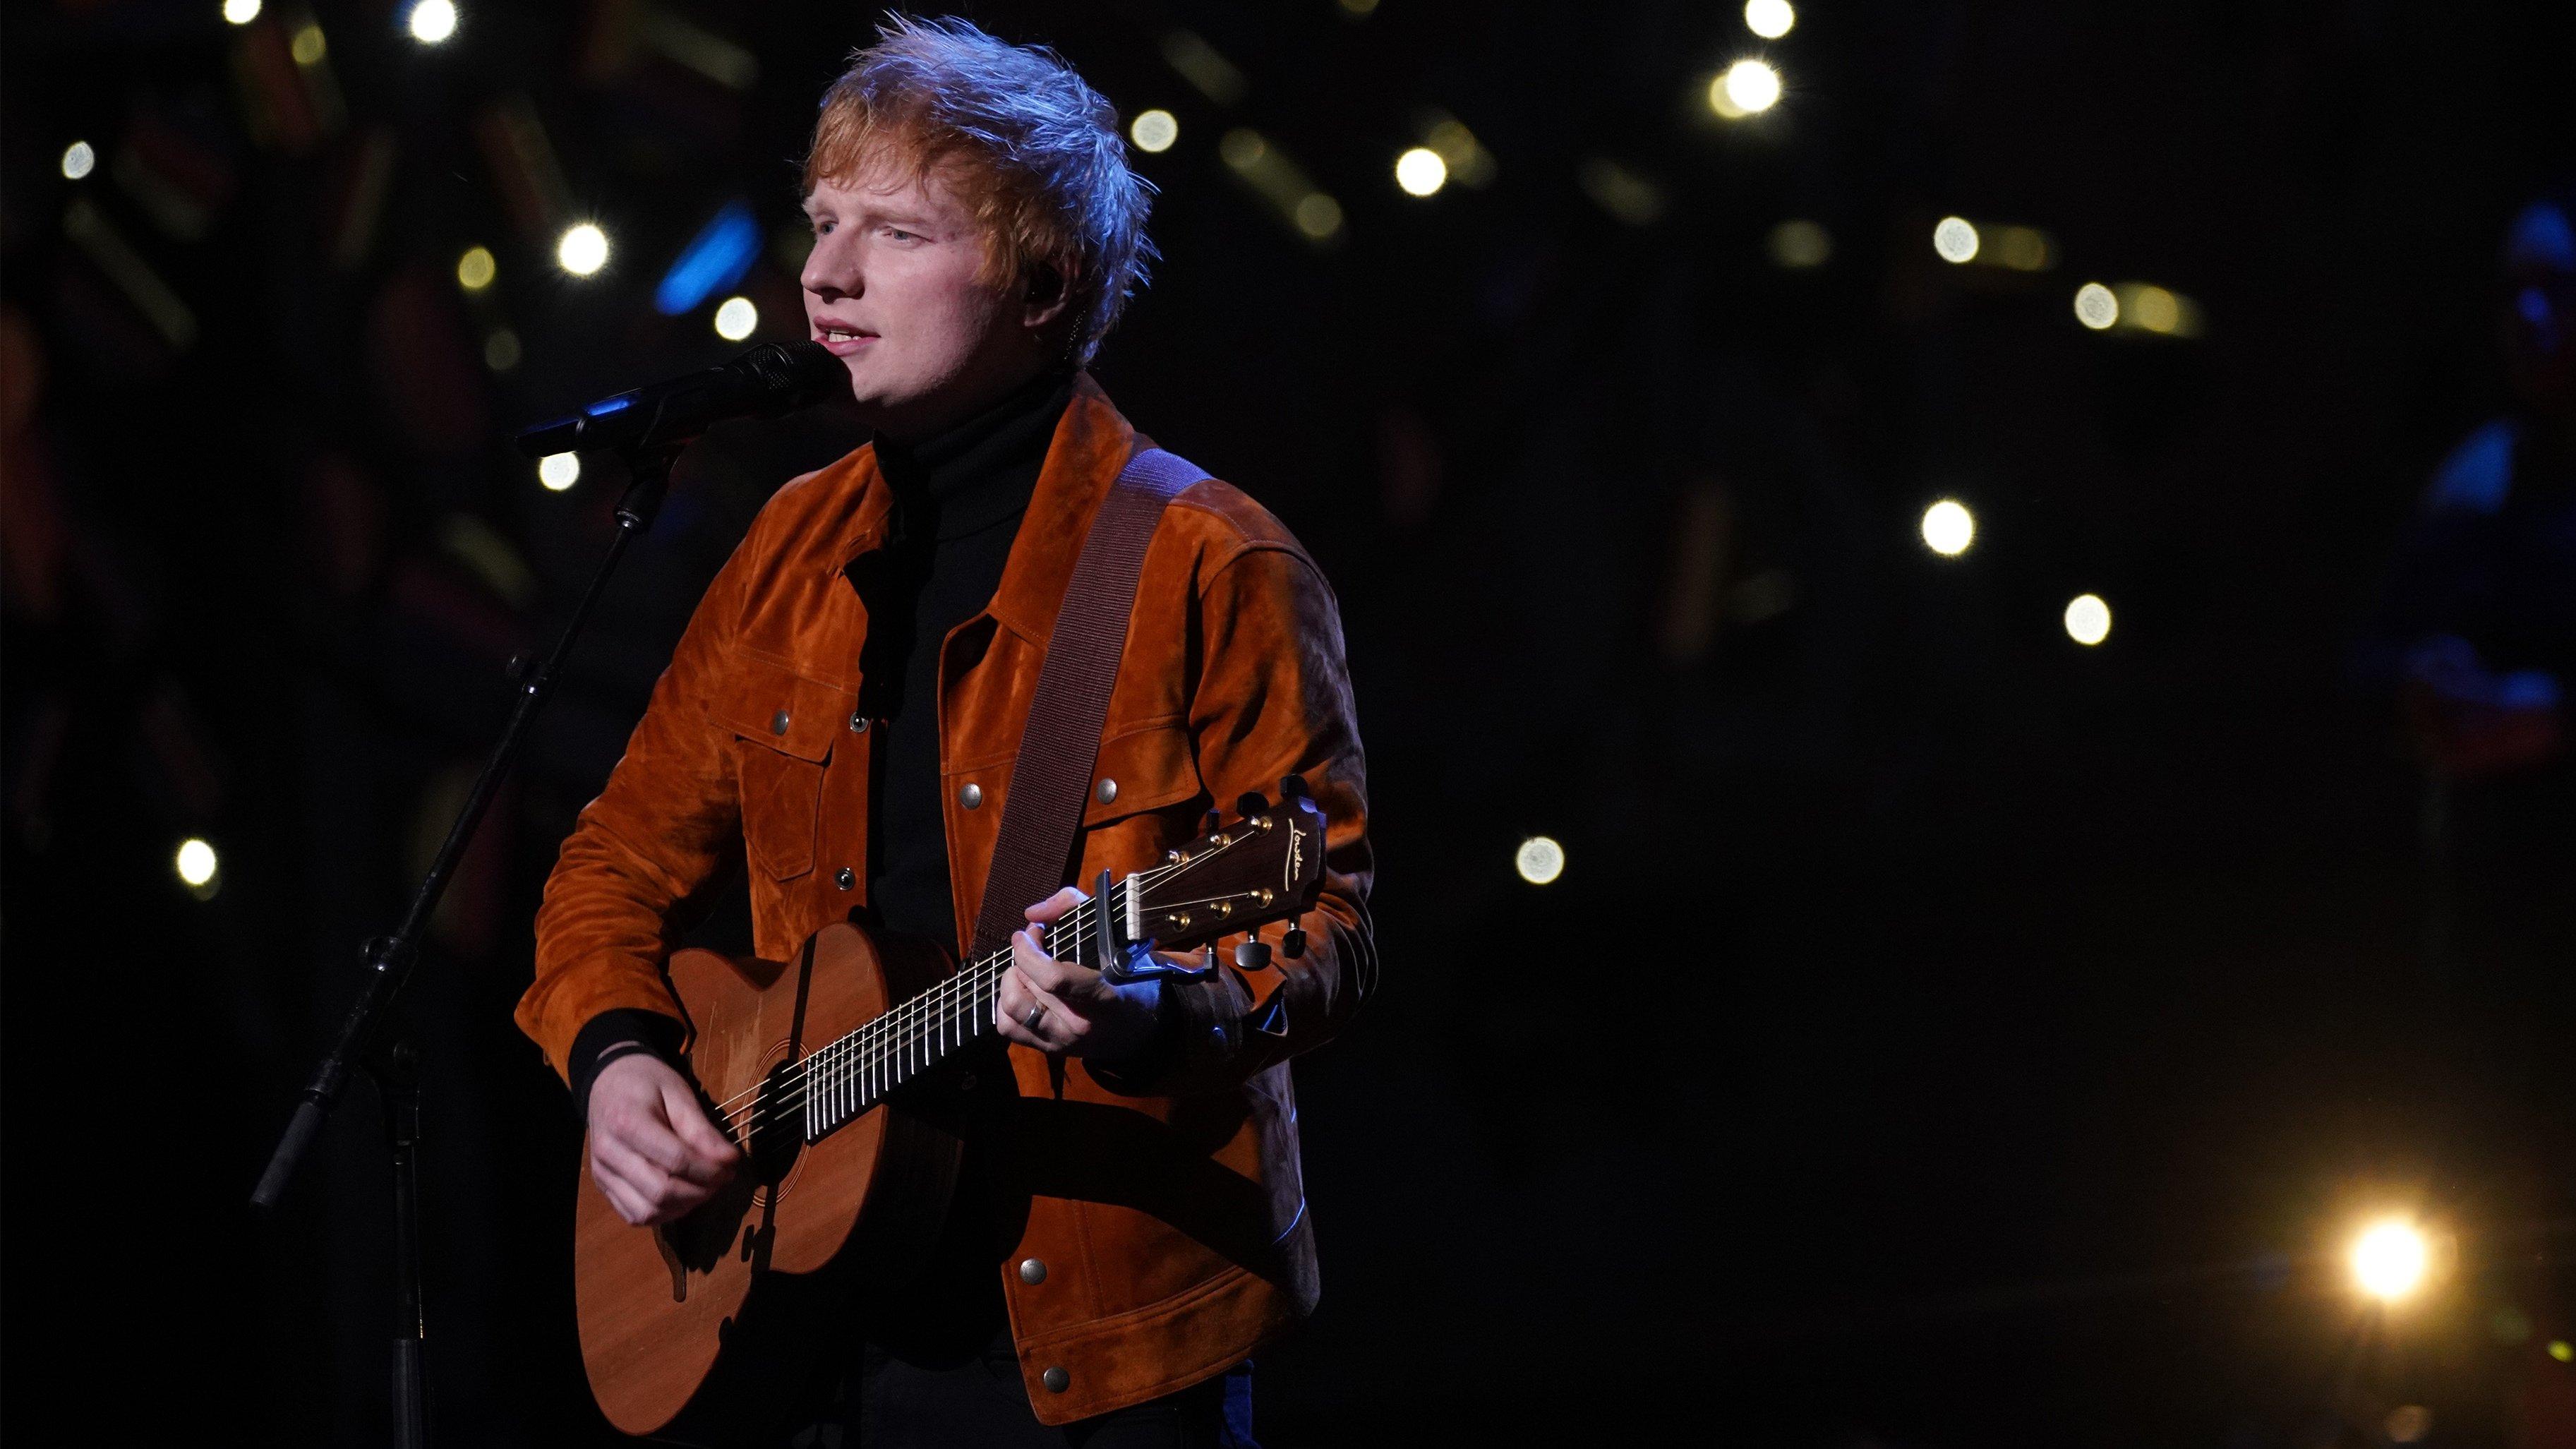 Ed Sheeran Has COVID, Will Do Performances From Home – NBC Los Angeles